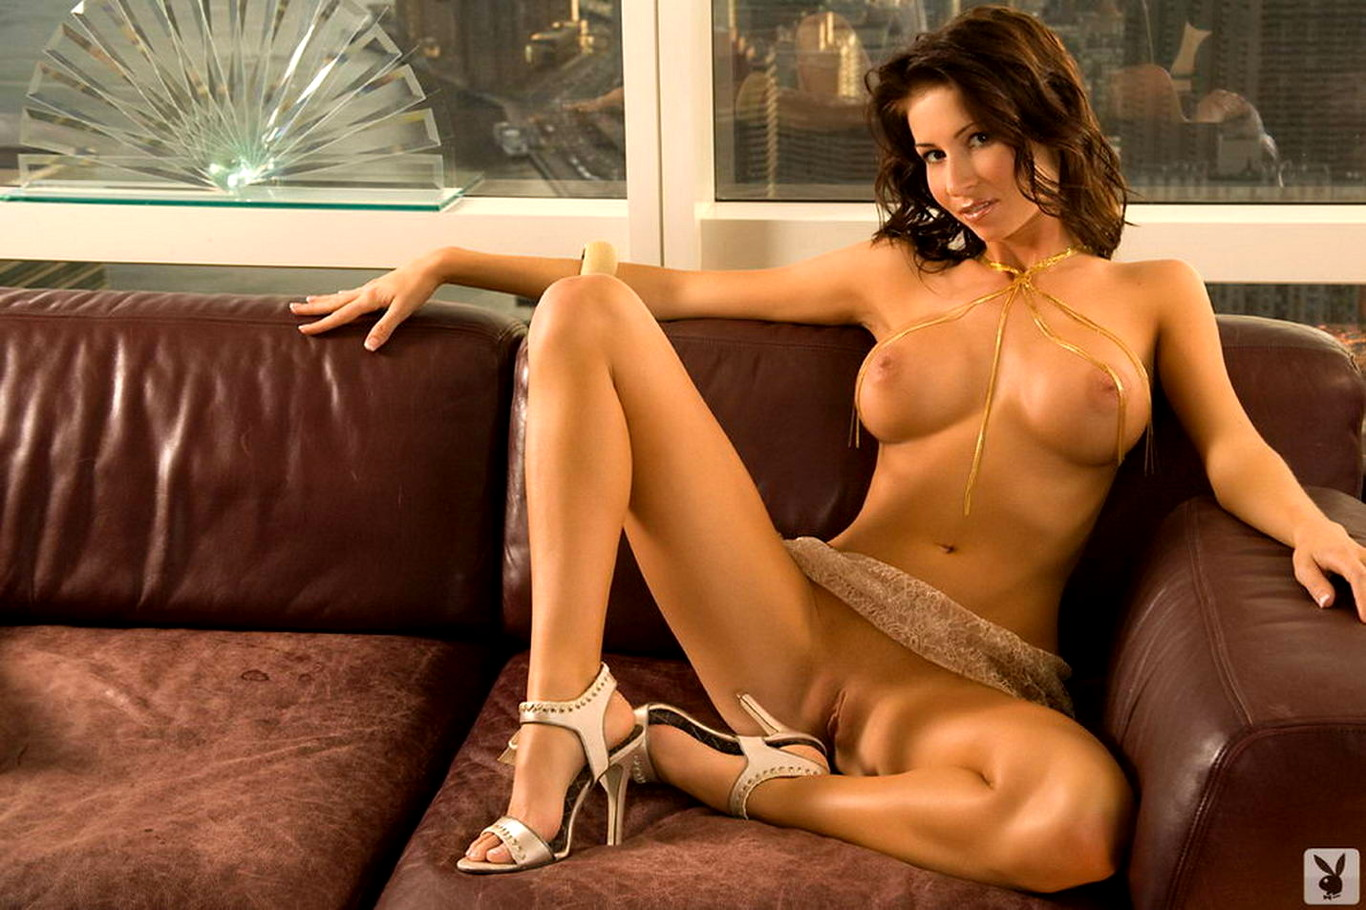 Sexy naked playboy models